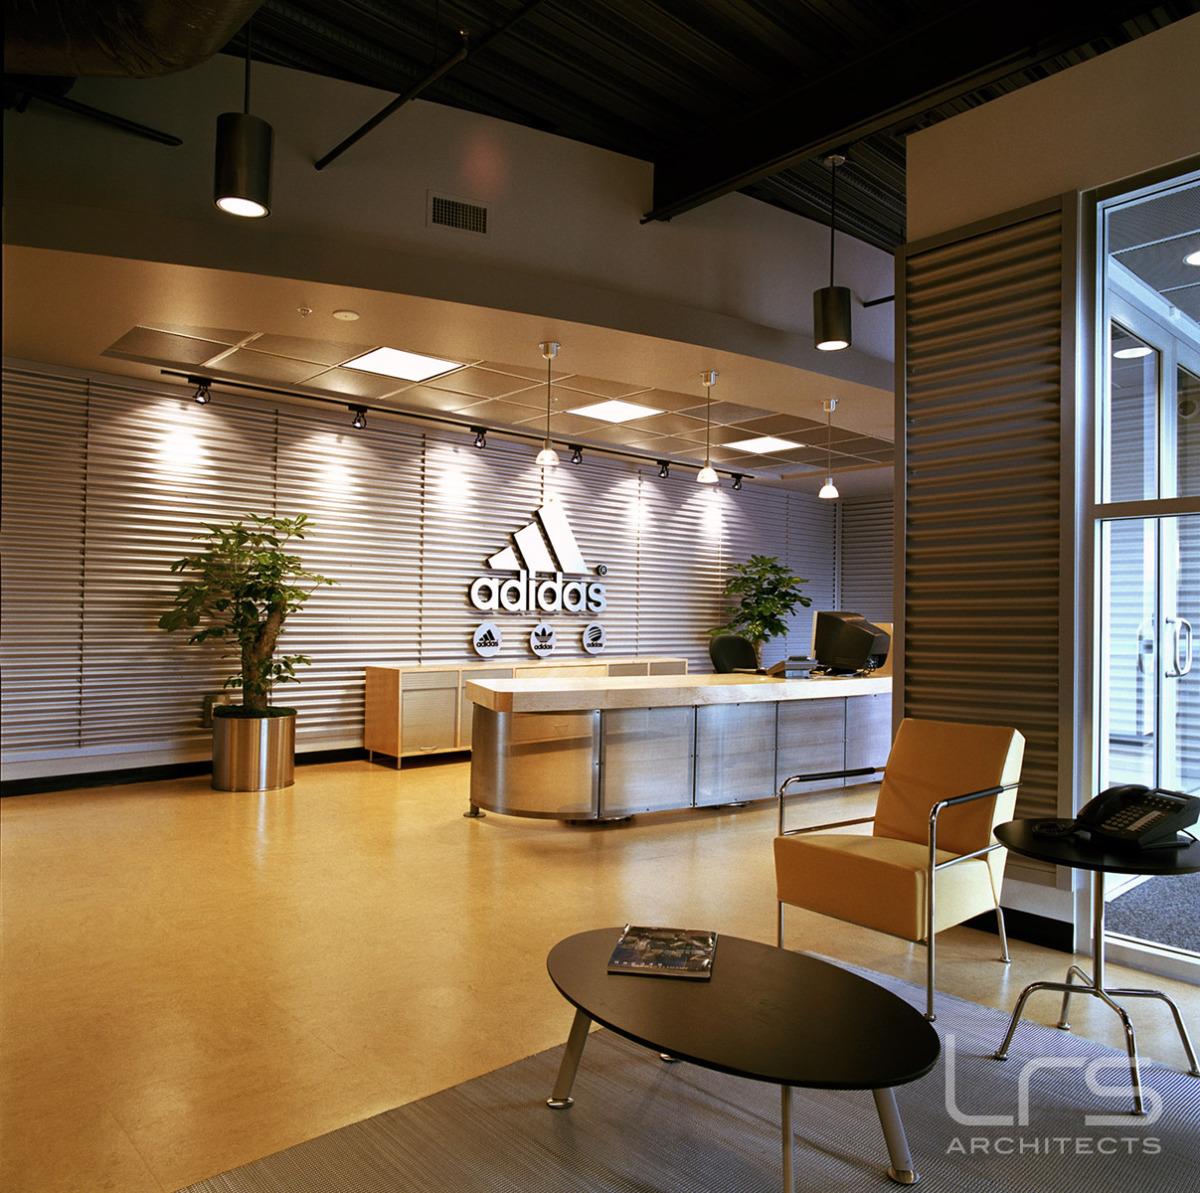 Corporate Interior Projects :: adidas lobby interior